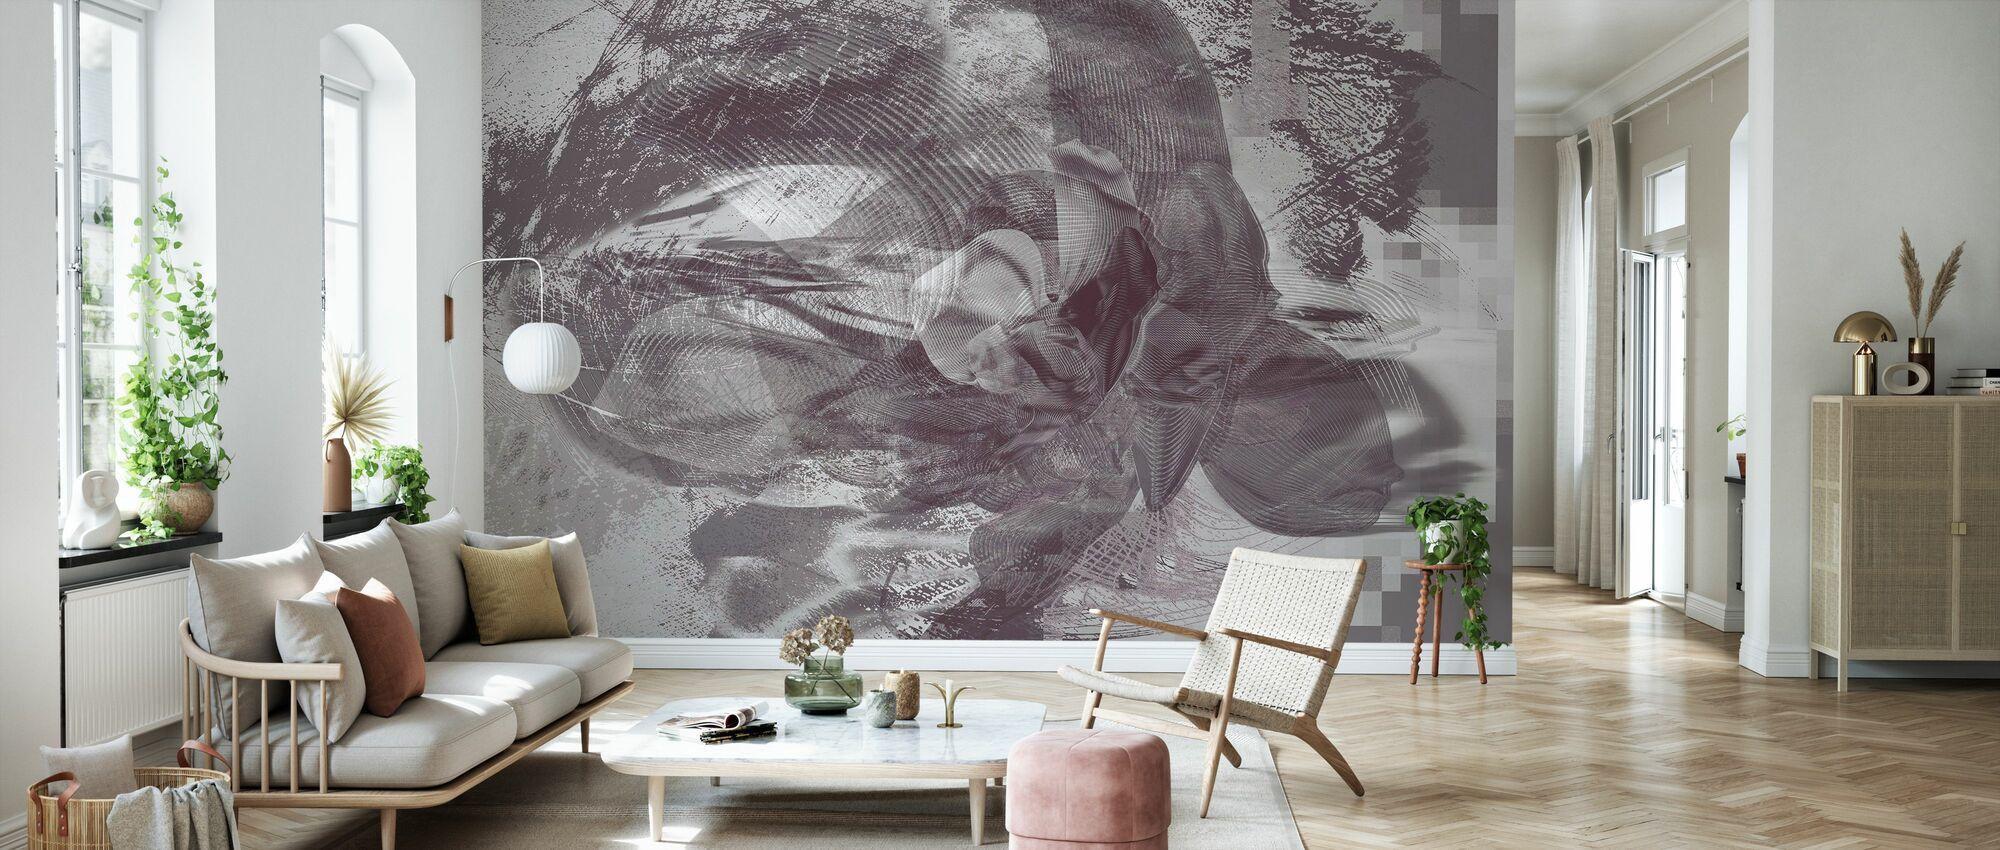 Orkidea Kaaos - Grafiitti - Tapetti - Olohuone